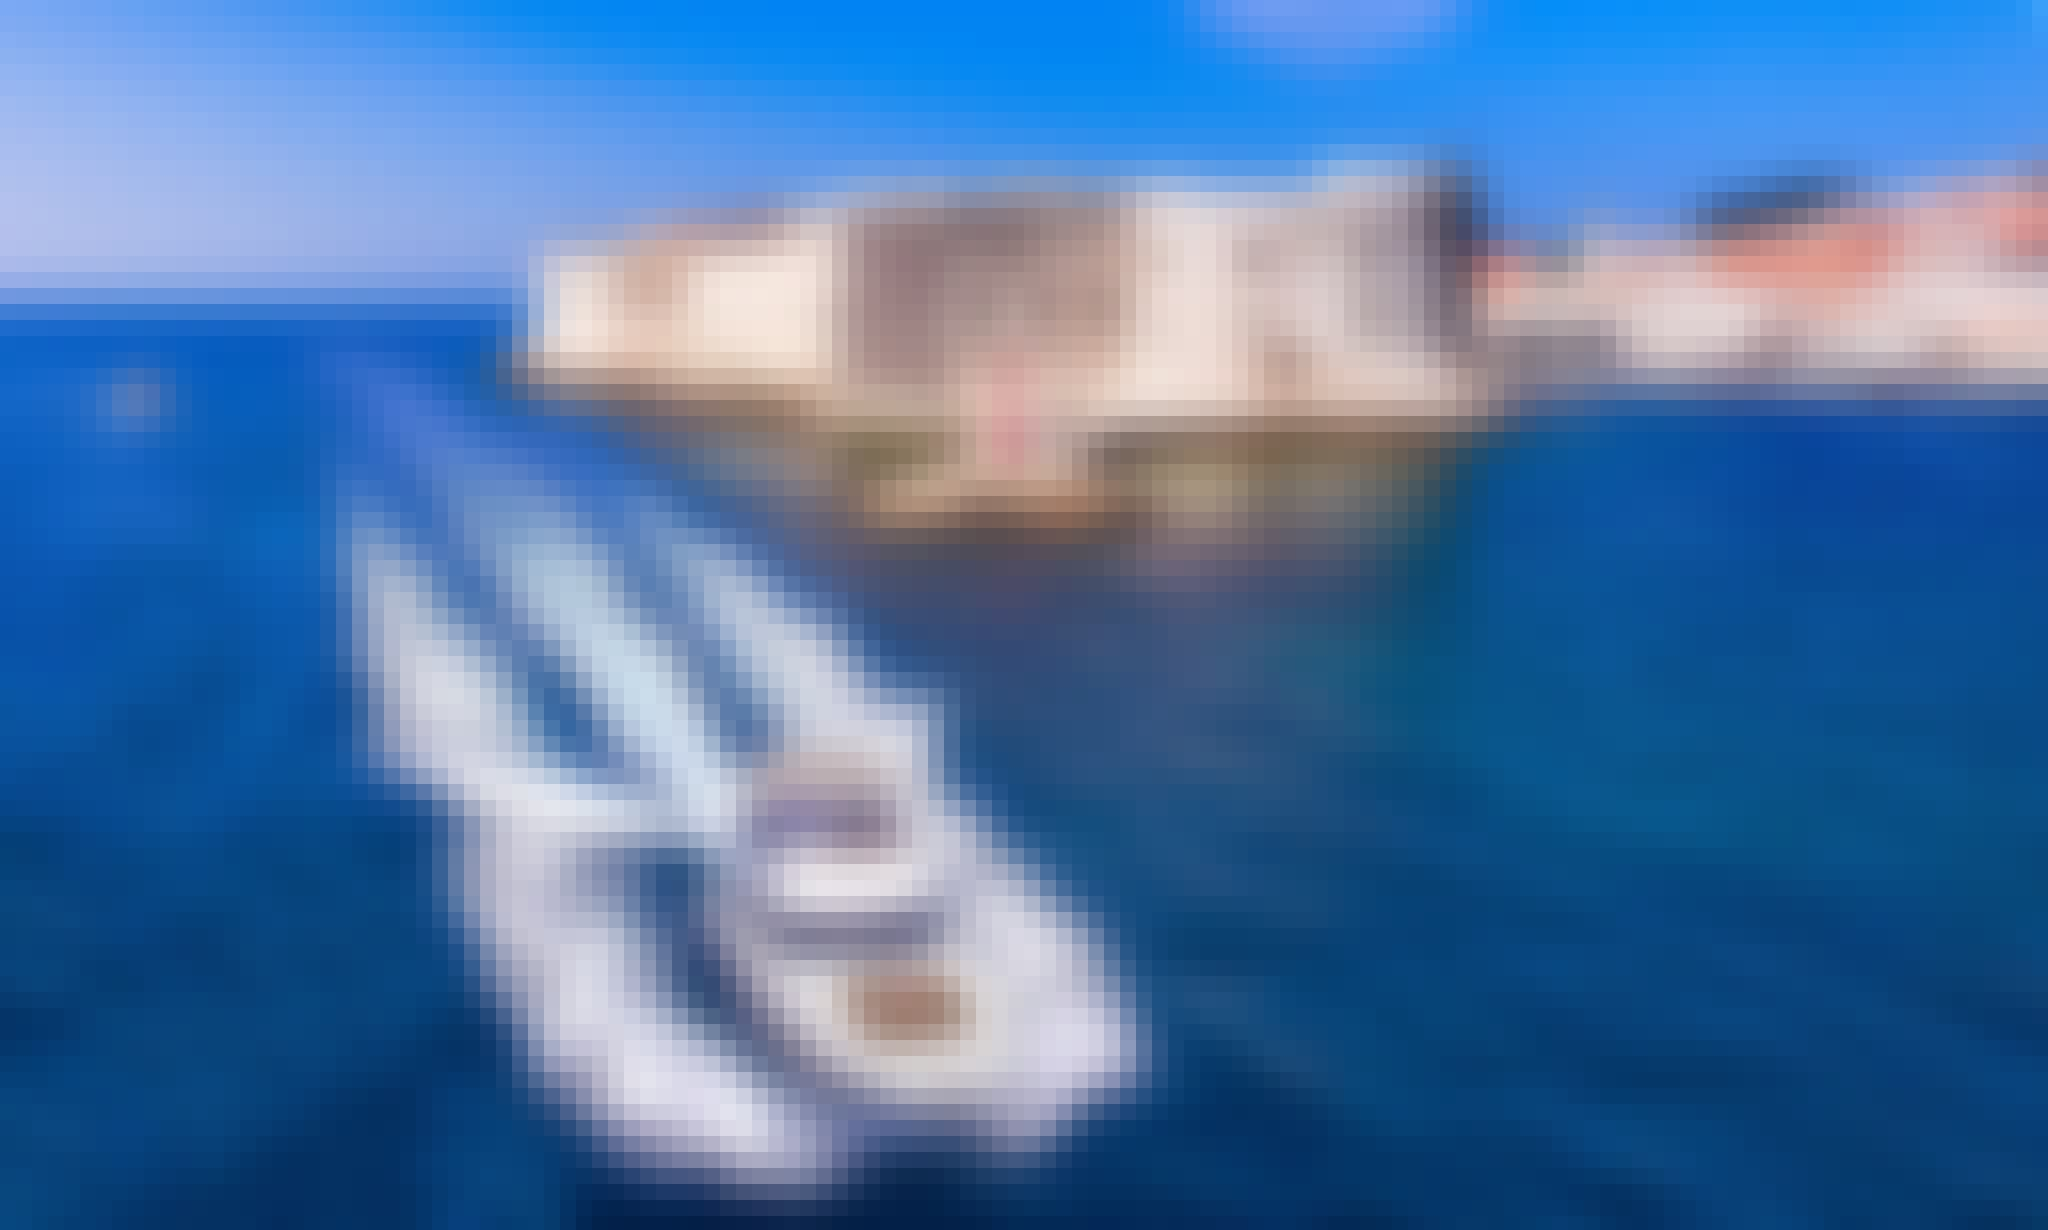 Power in Dubrovnik